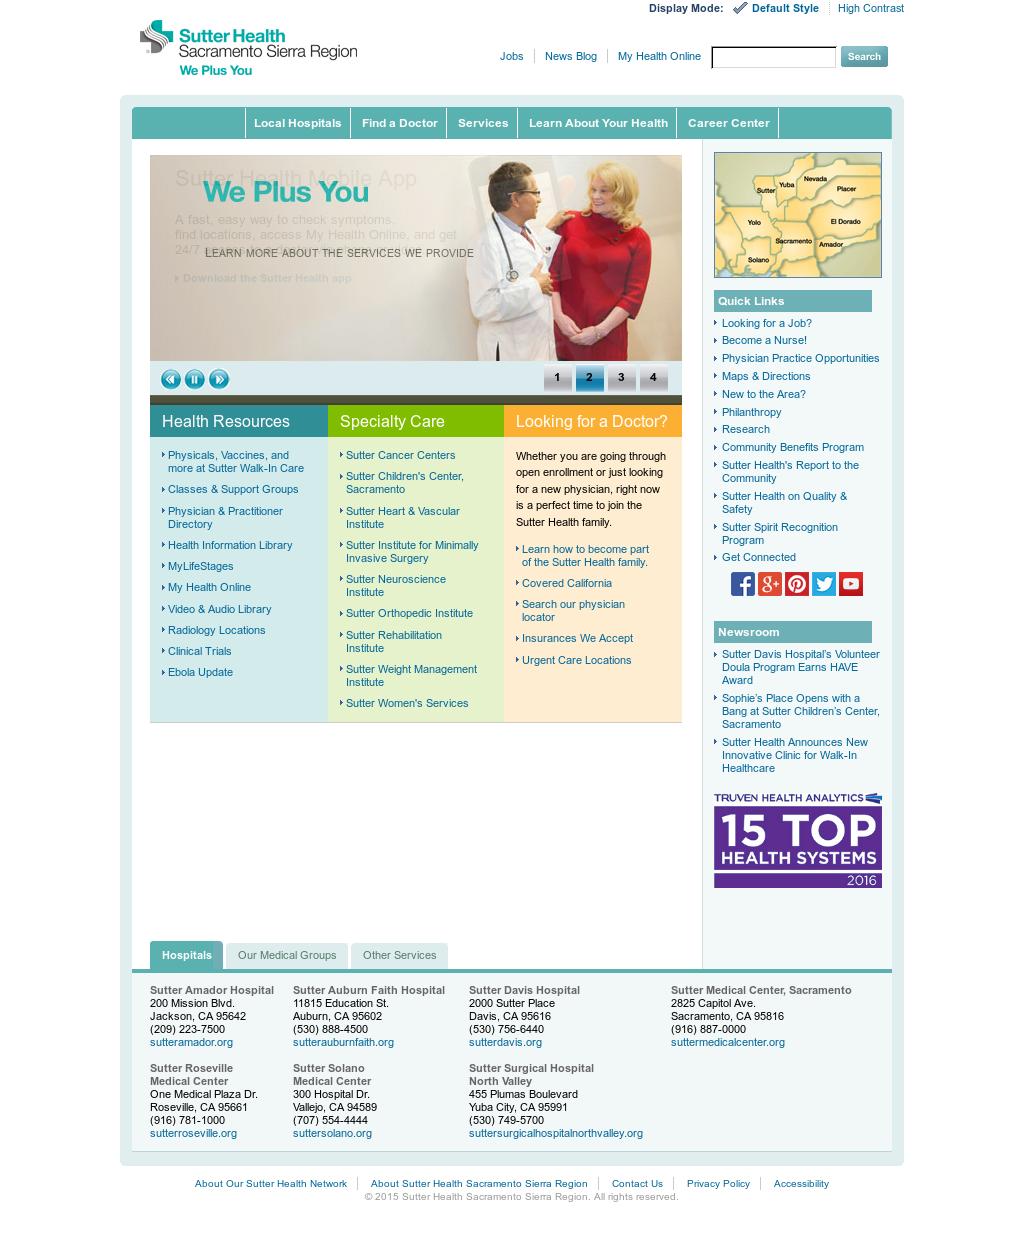 Sutter Health Sacramento Sierra Region Competitors, Revenue and